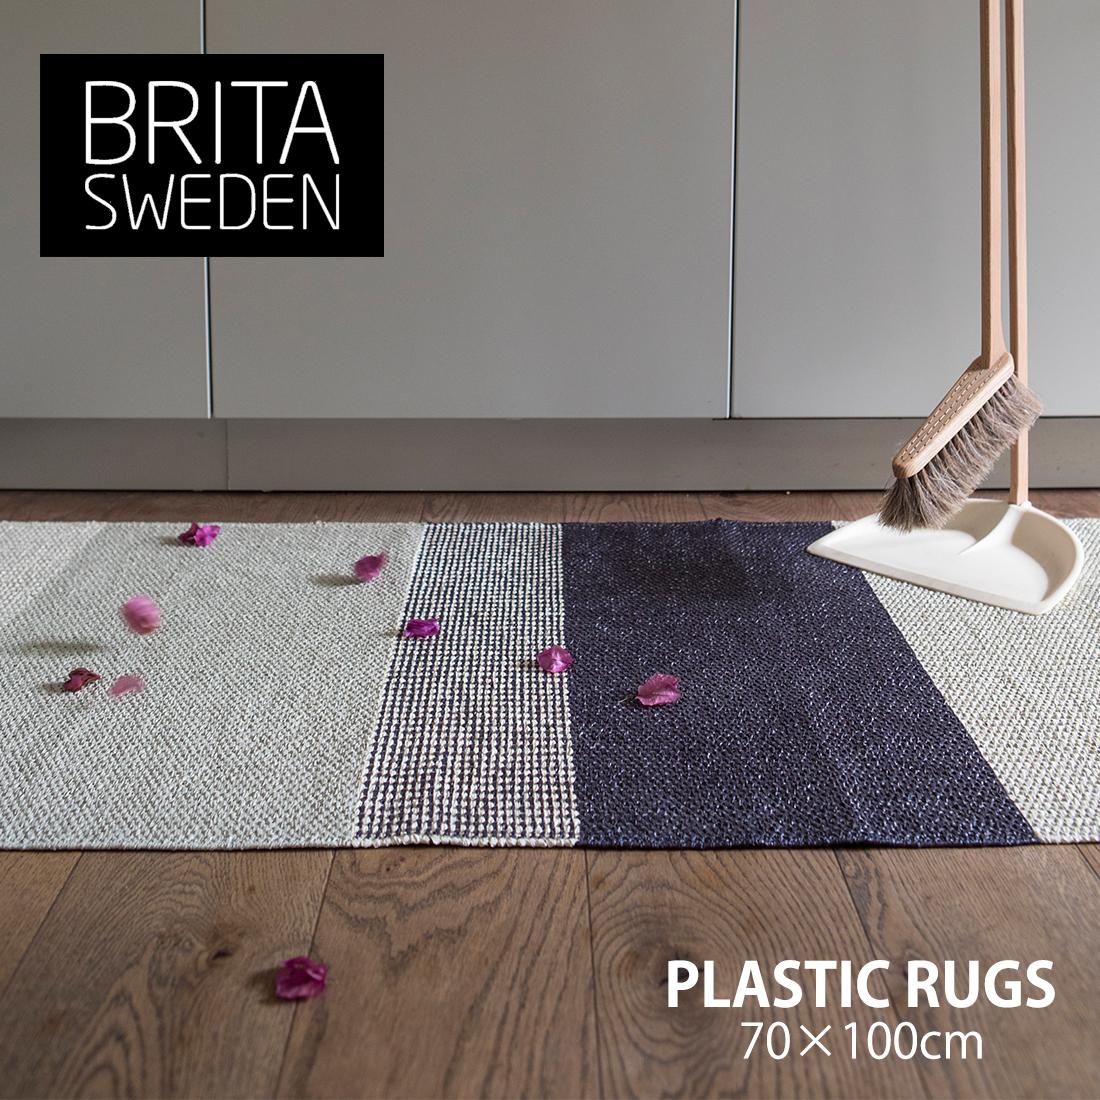 【BRITASWEDEN】PLASTIC RUGS 約70×100cm フロアーラグ ブリタスウェーデンラグマット 北欧 スエーデン テキスタイル カーペット スウェーデン